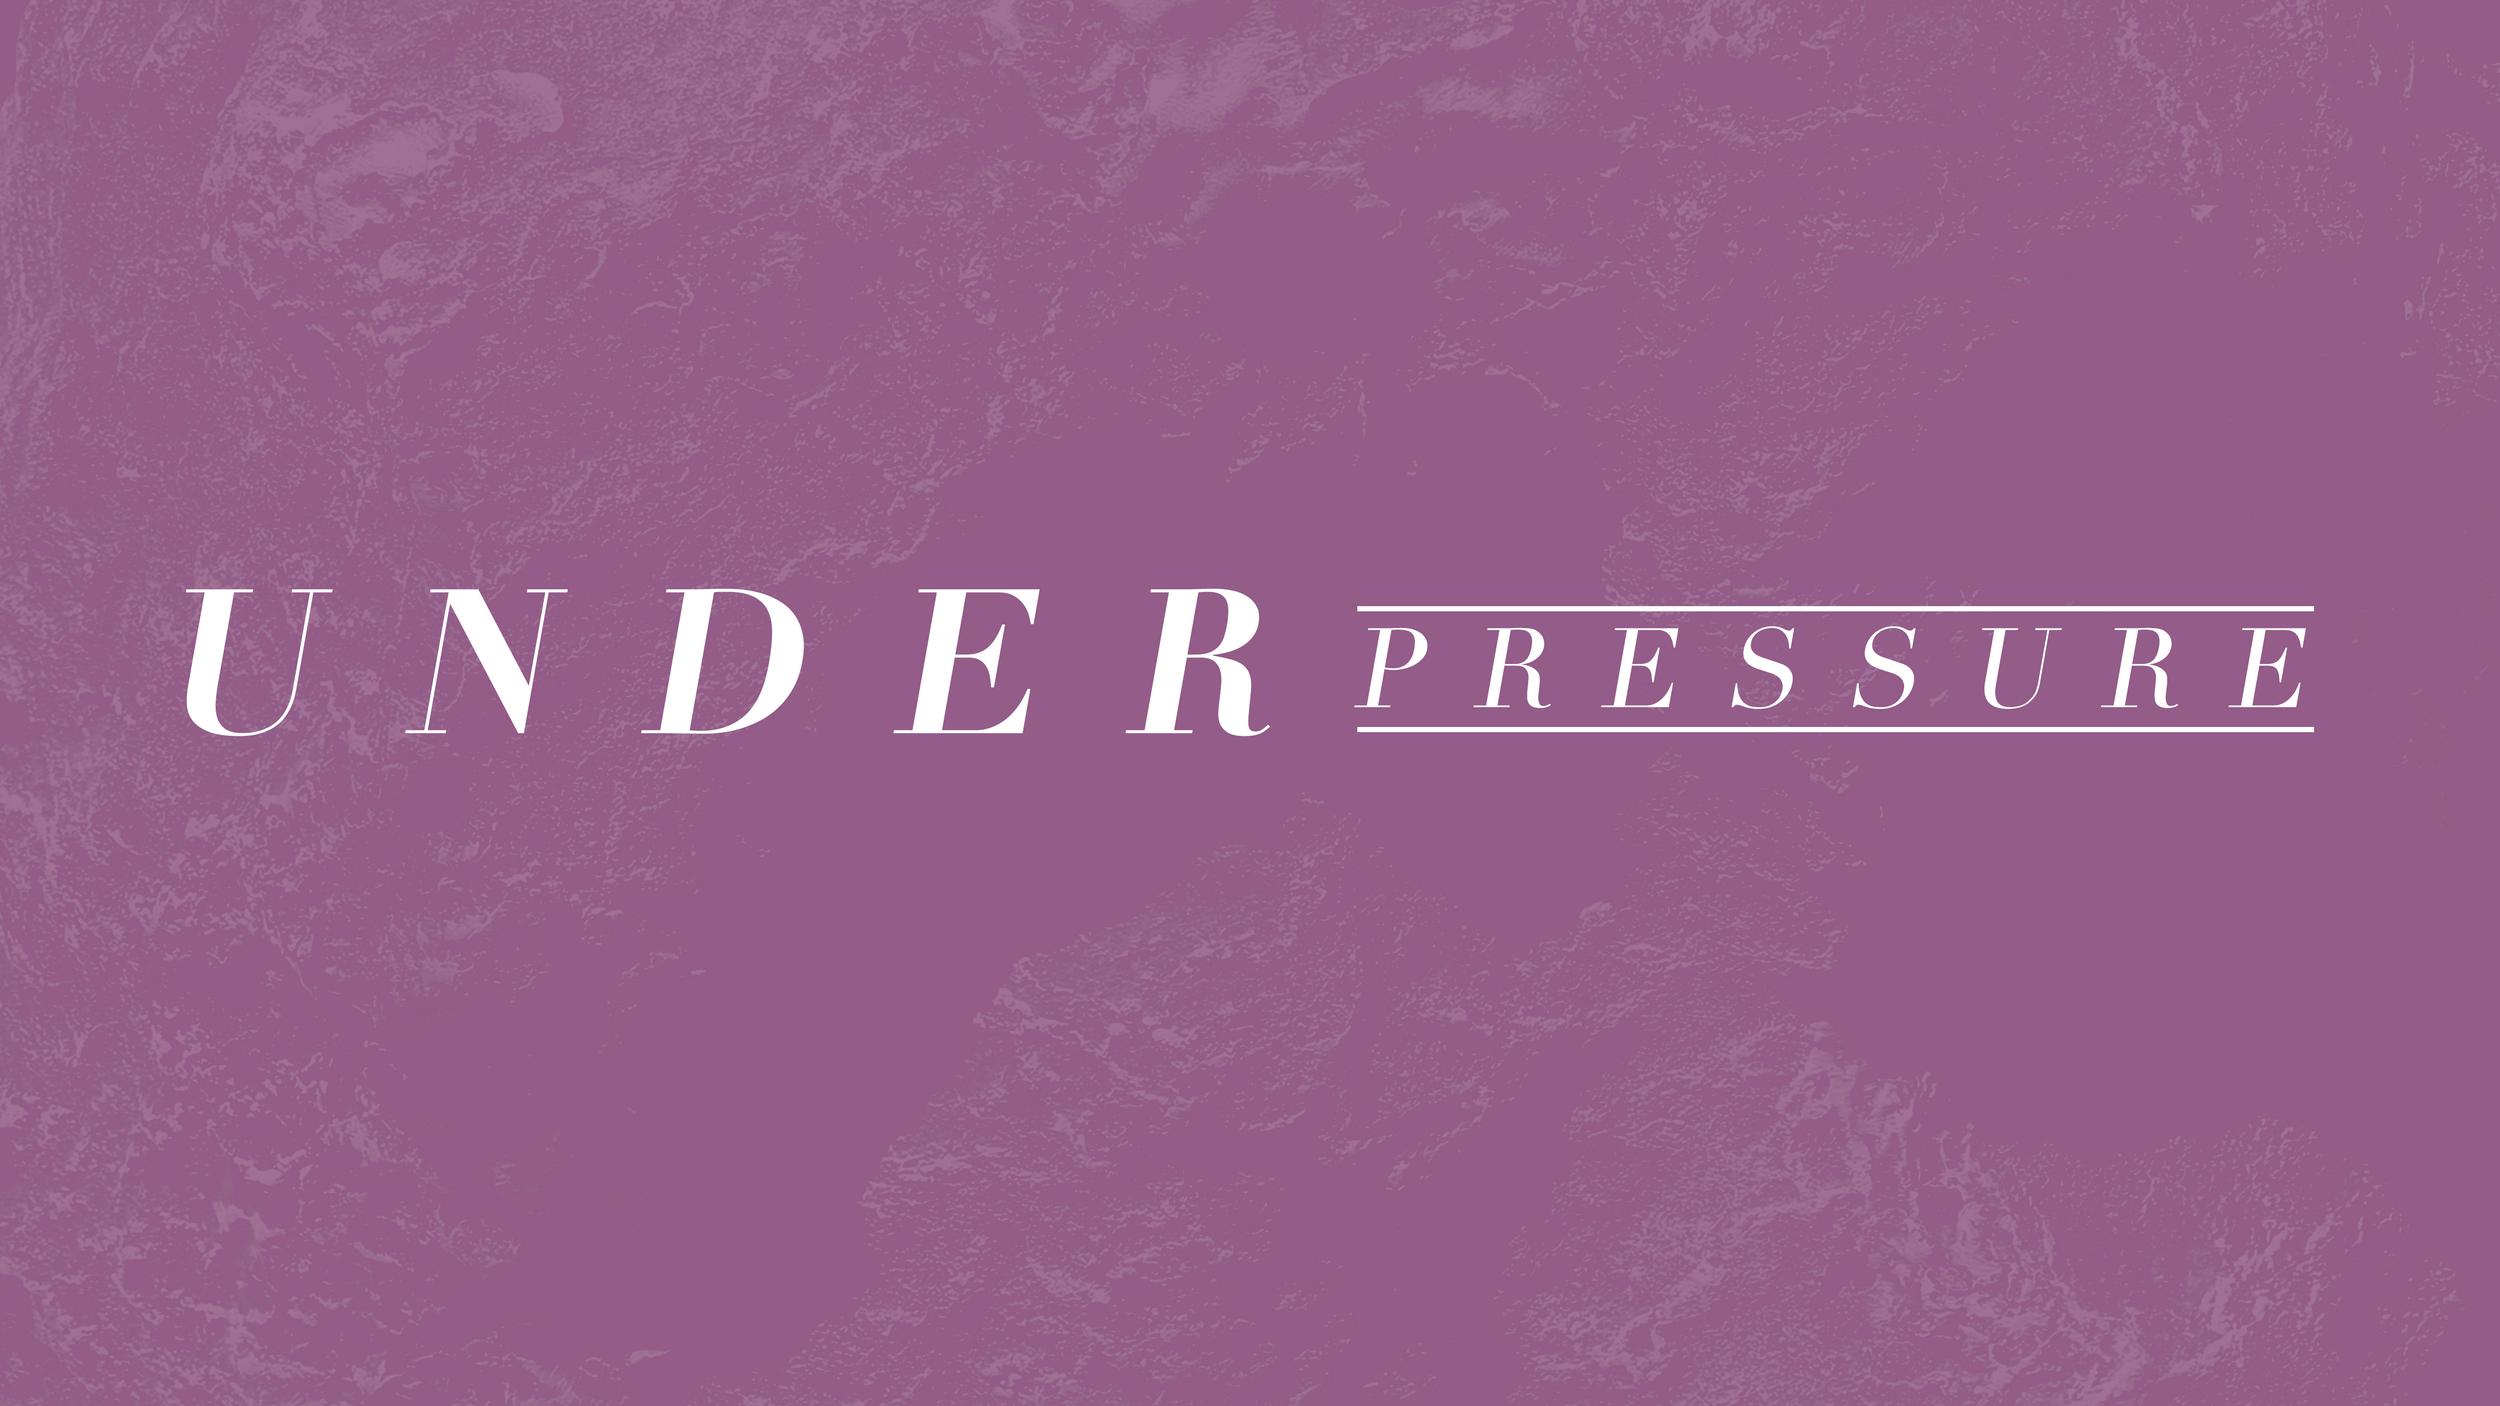 Under Pressure1.jpg